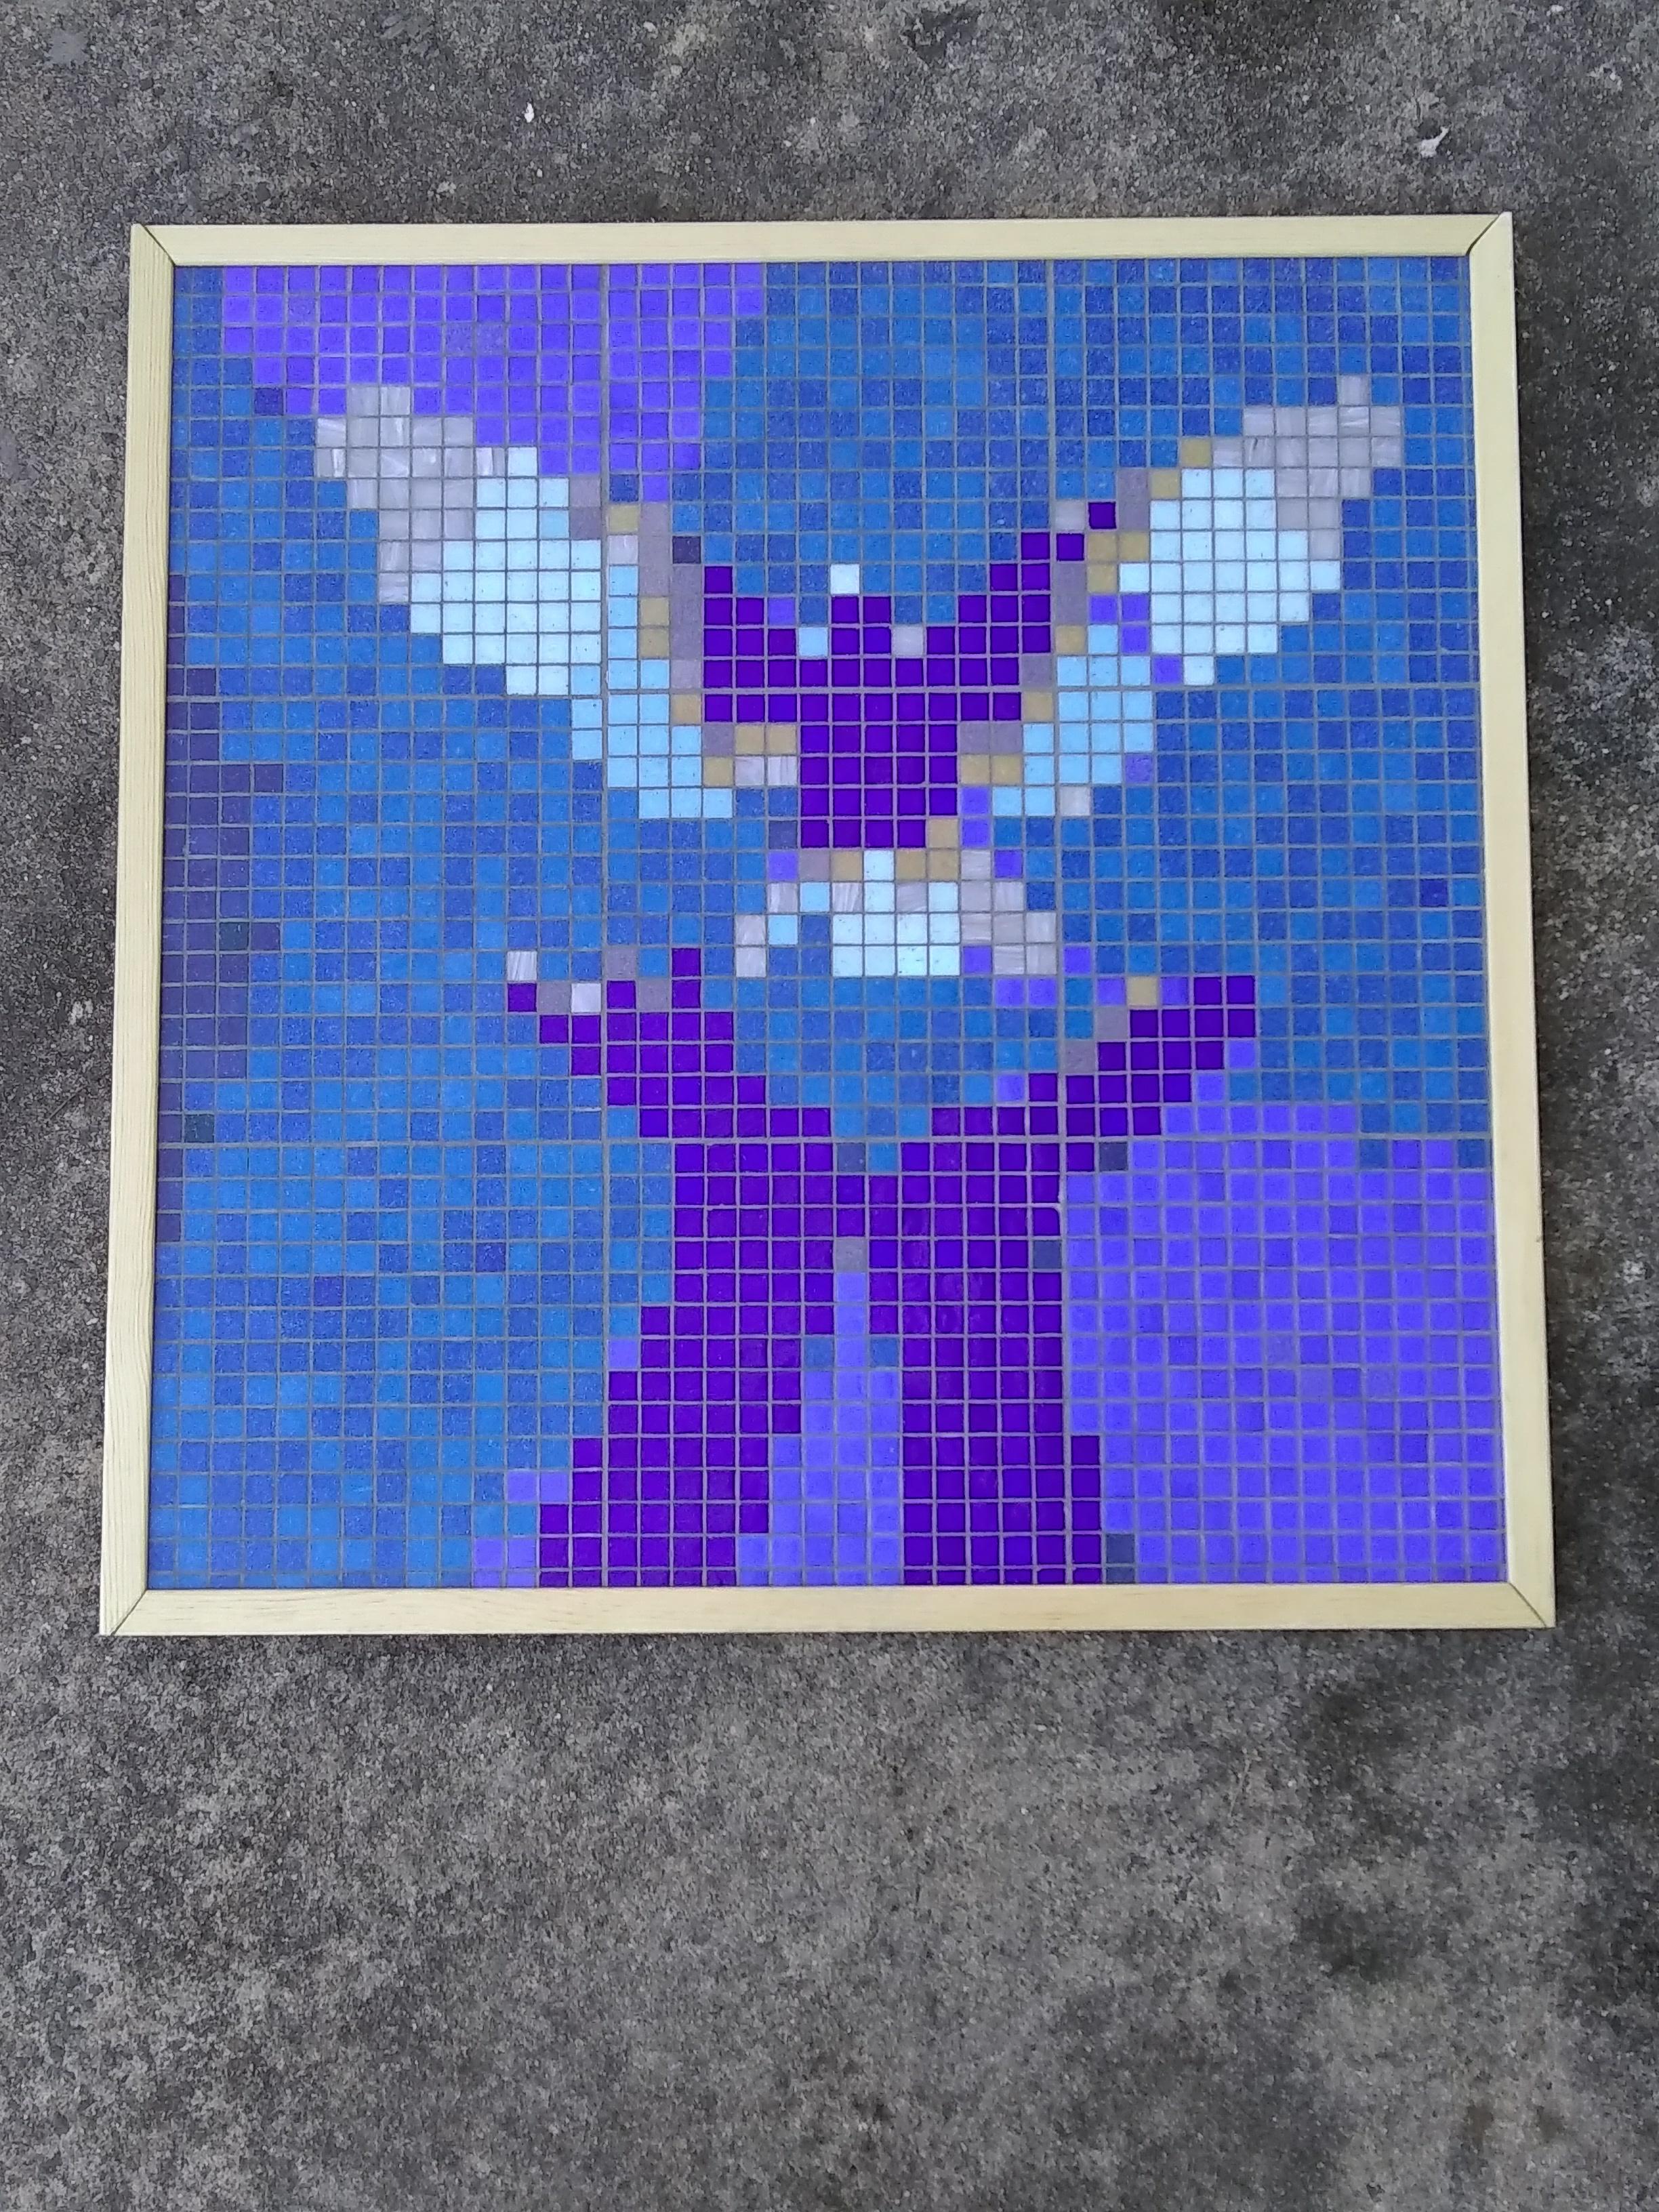 Rogers Herr Middle School, Durham NC Art Club, pixel art mosaic tile with Jeannette Brossart, CAPS